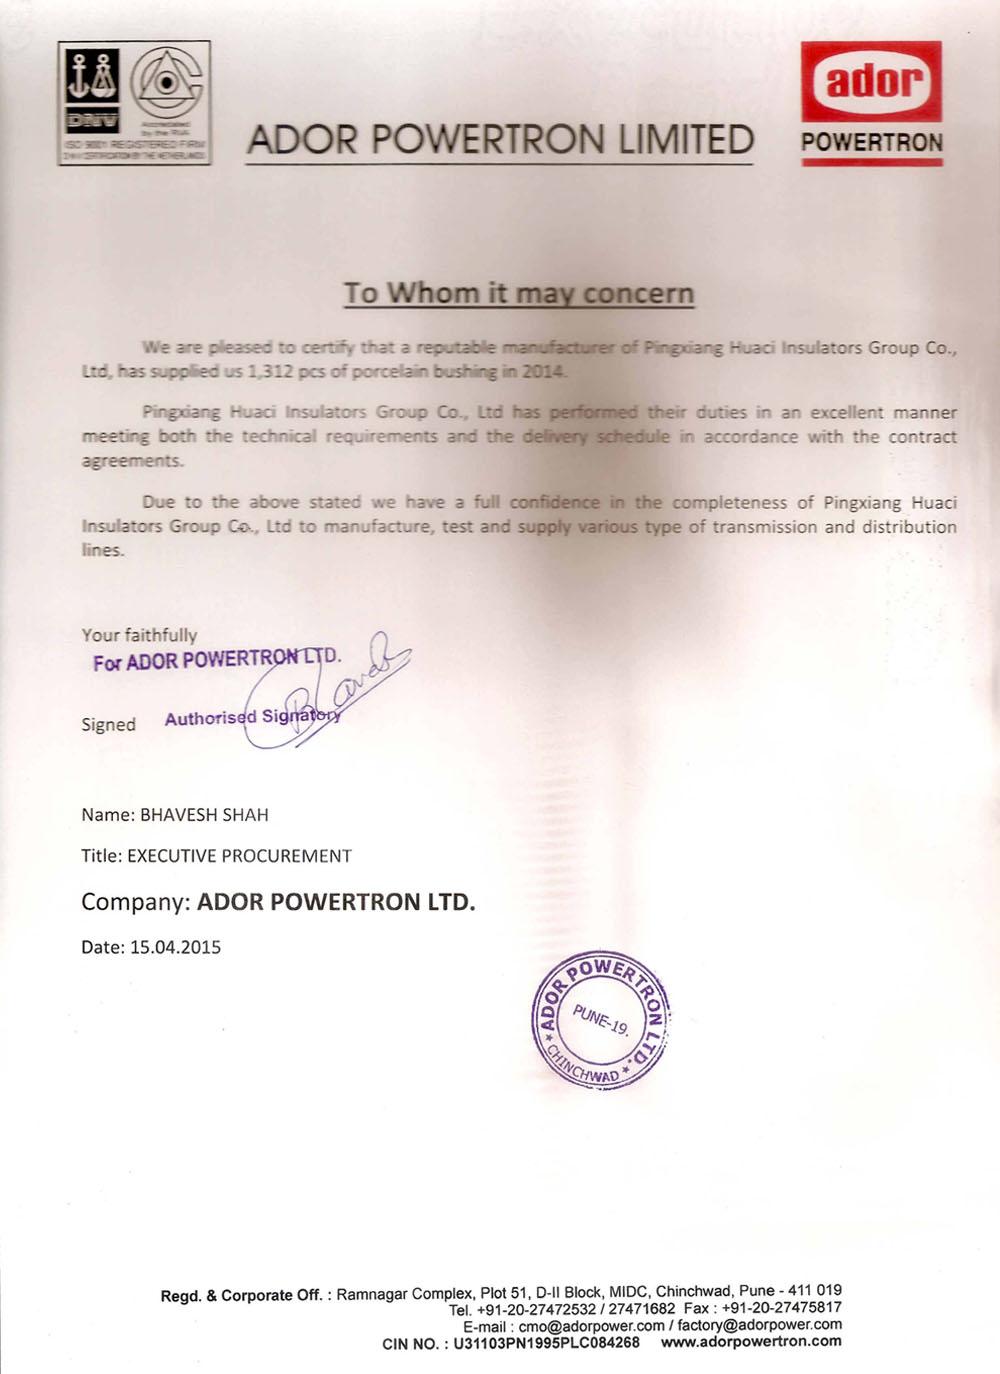 India Ador Powertron Limited